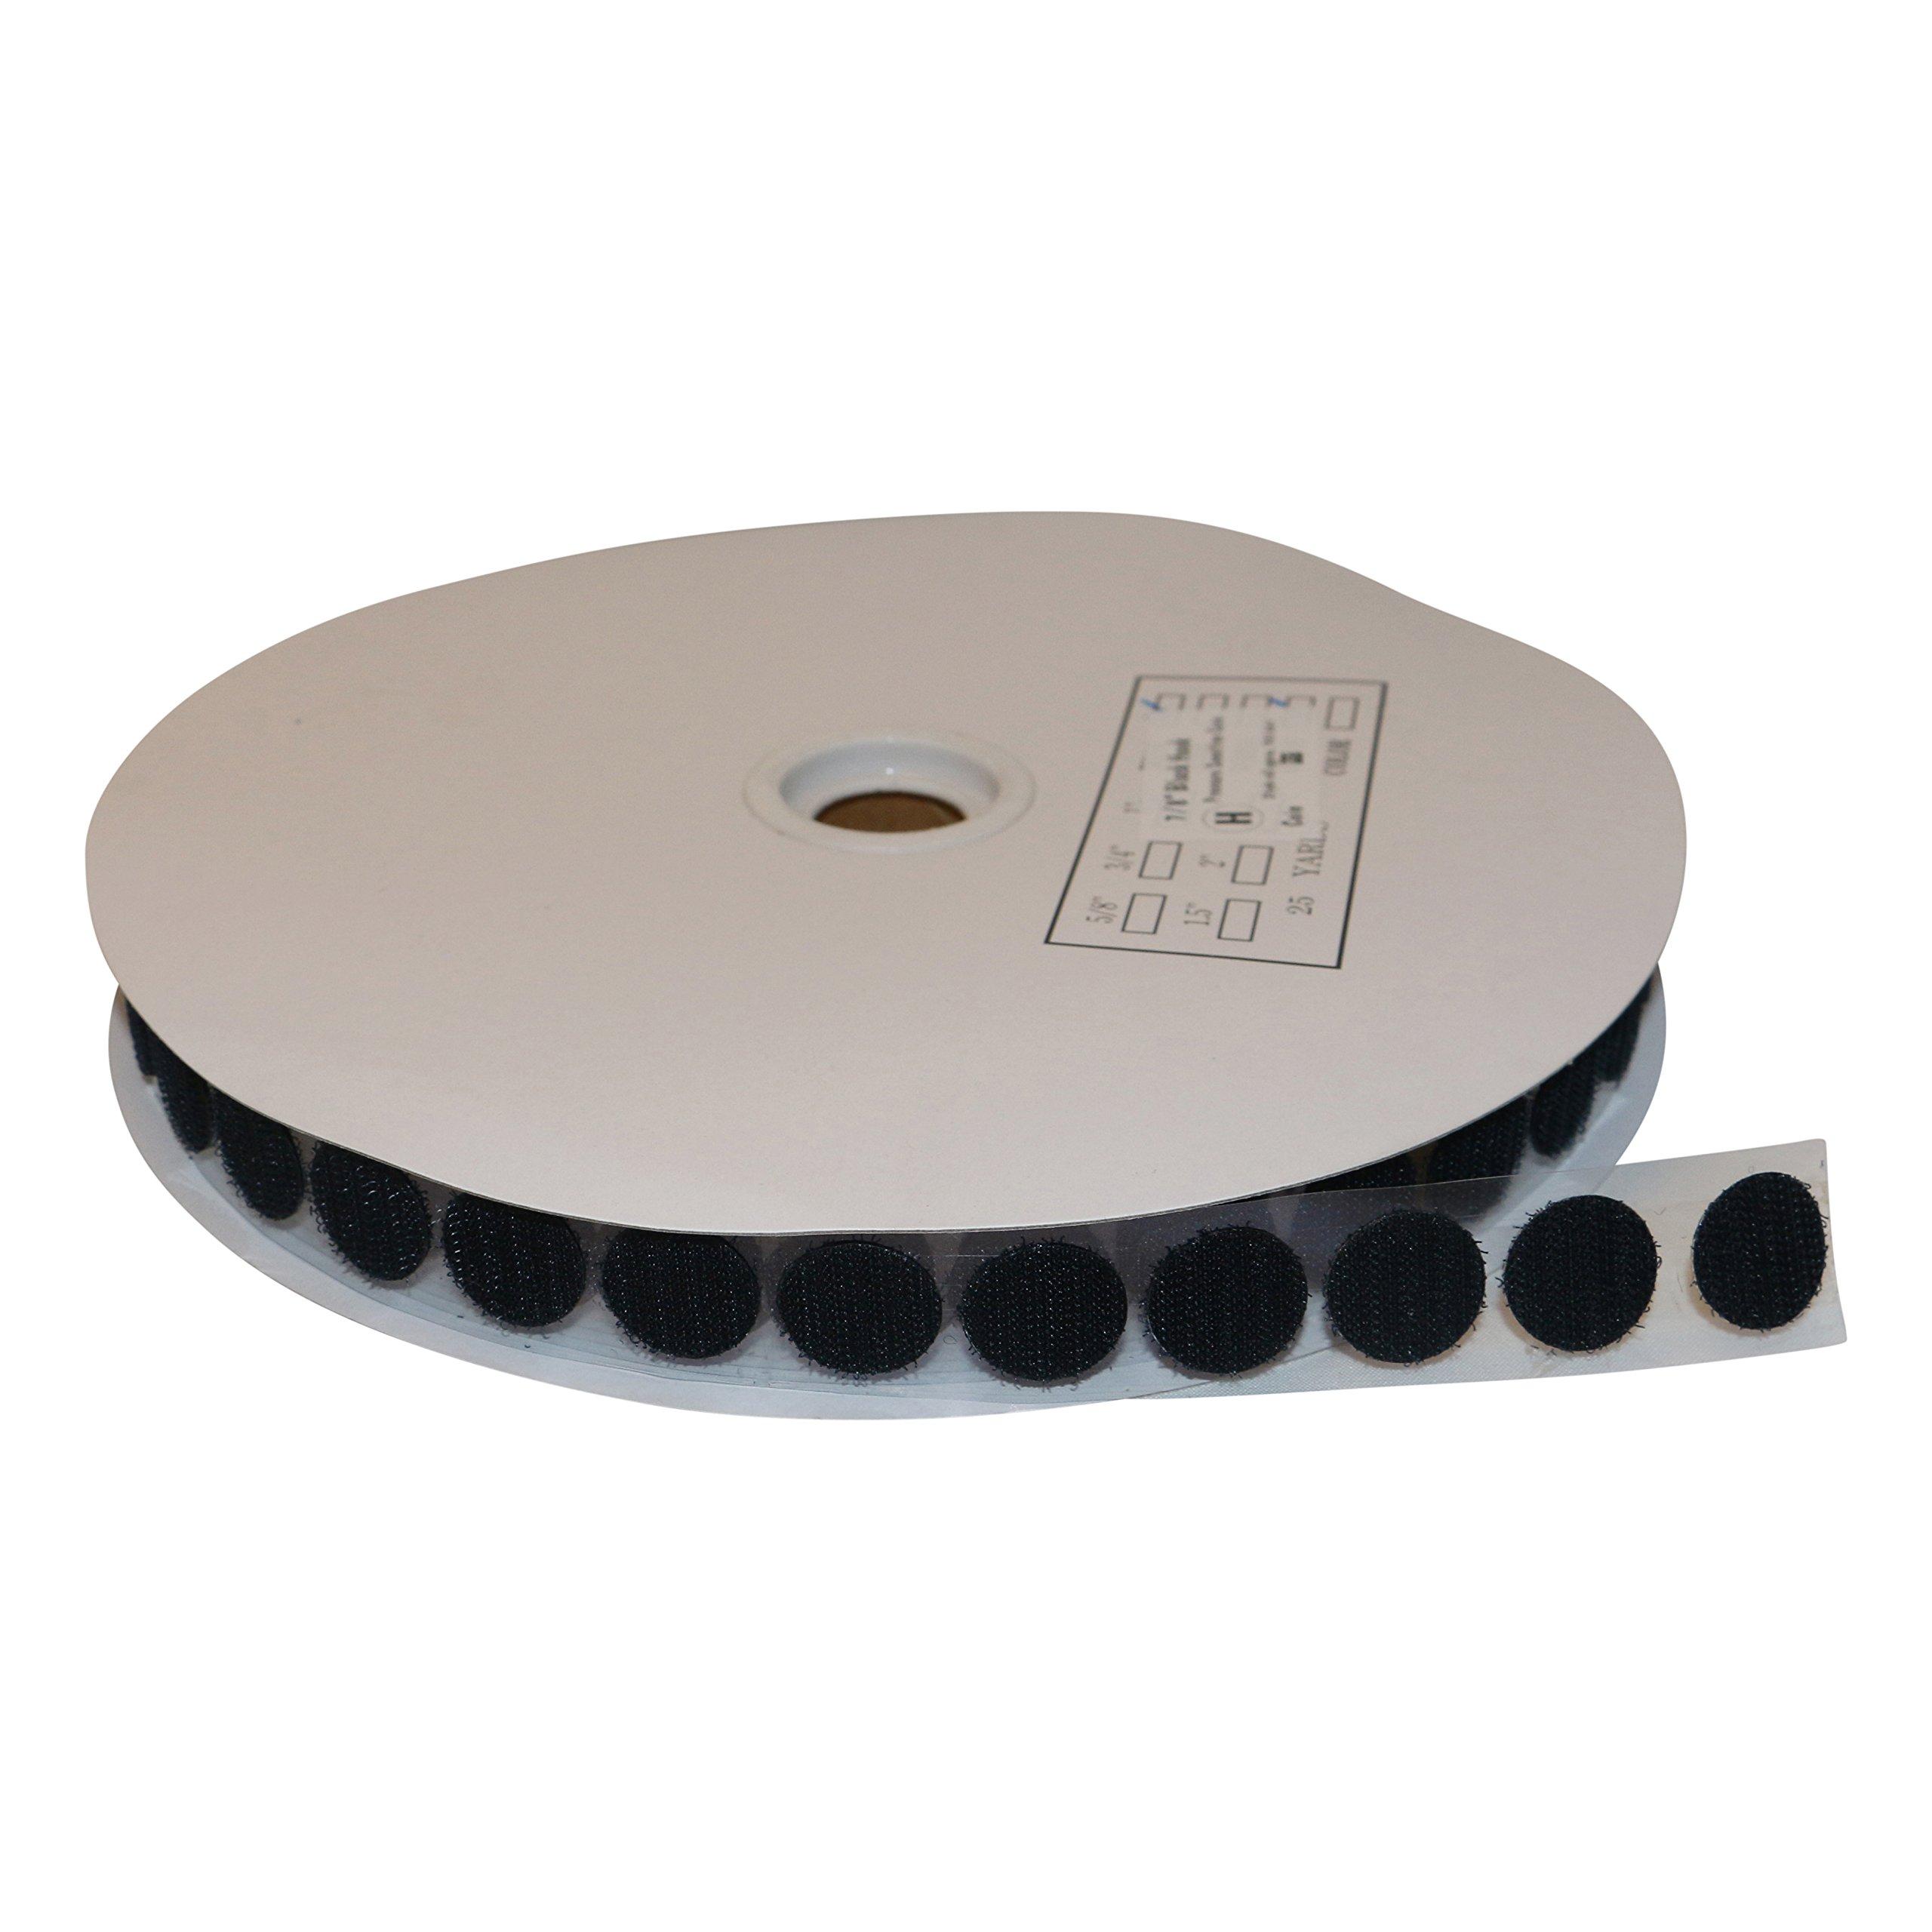 FindTape HL74-C Adhesive-Backed Hook-Side Only Coins/Dots: 7/8 in. x 75 ft. (Black) / hook-side only [900 coins/roll] by FindTape